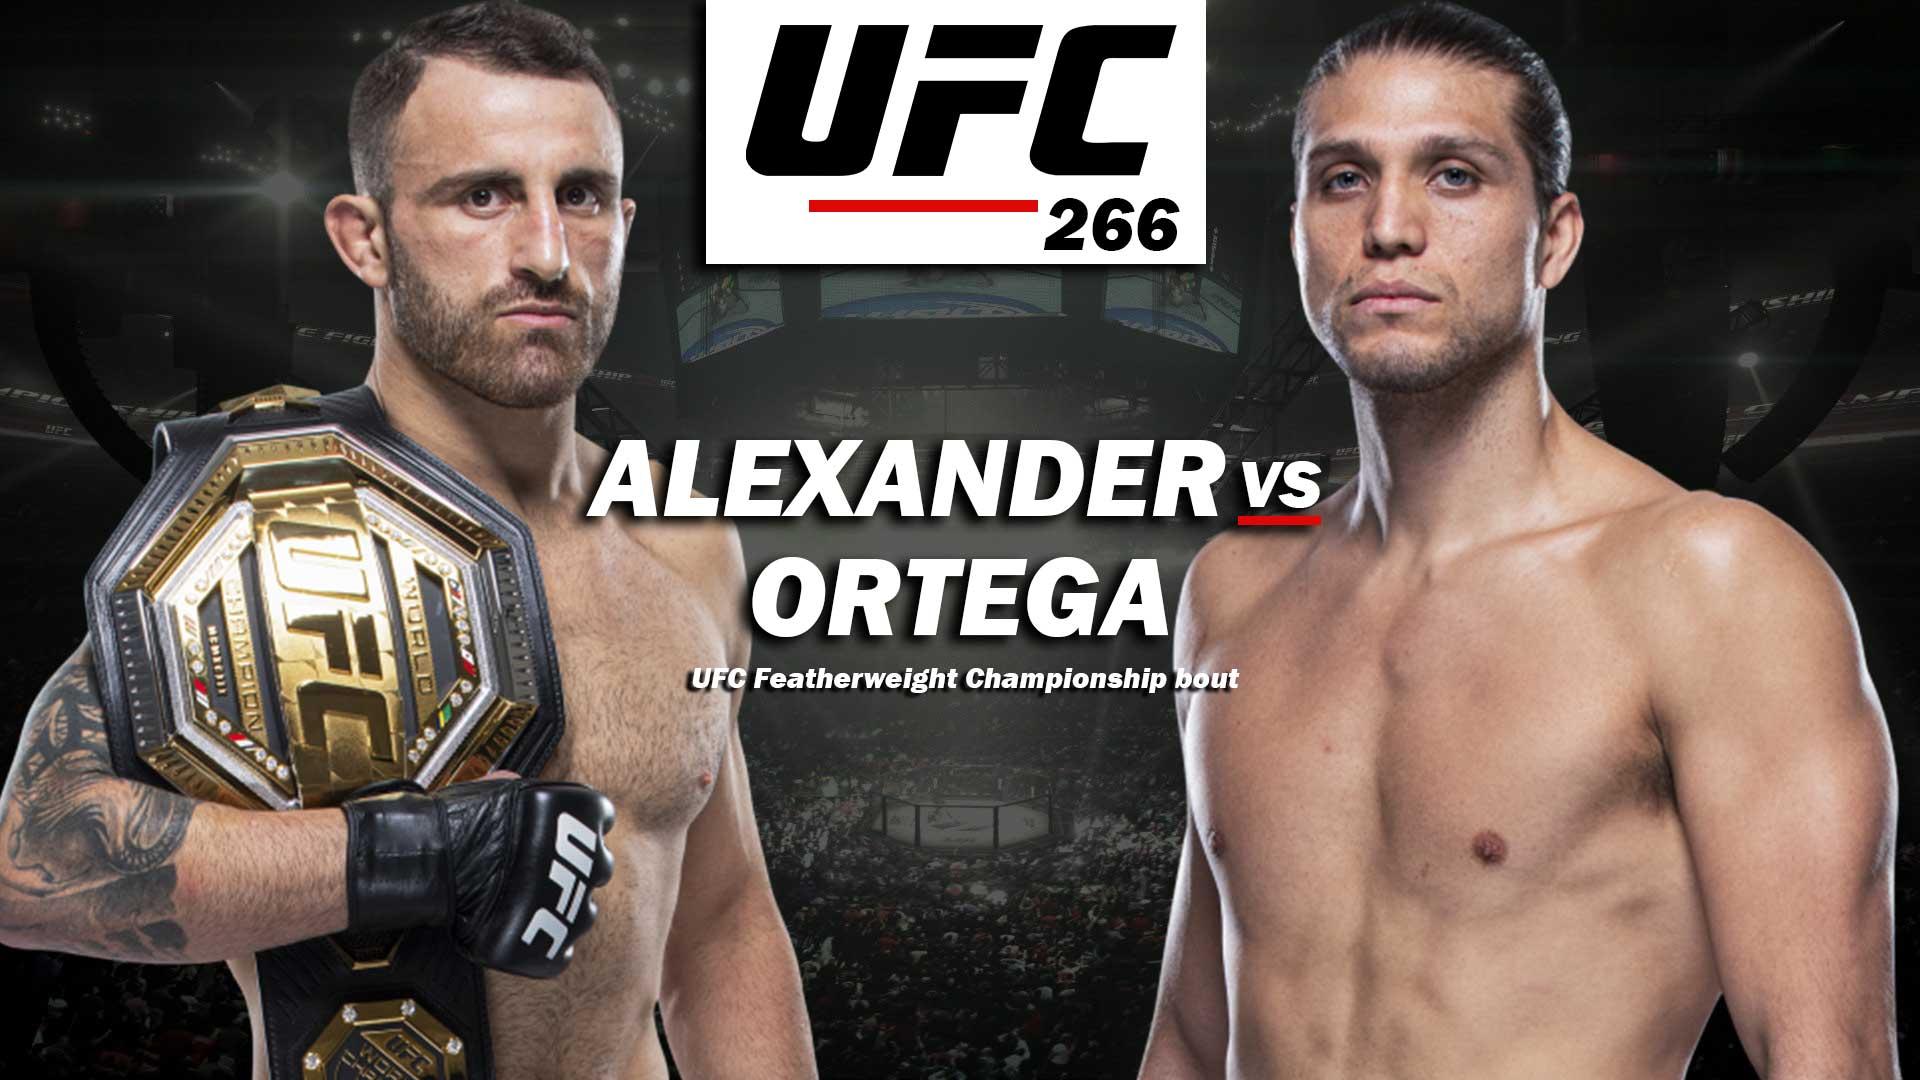 UFC 266: Nick Diaz Comes Back, Ortega Attacking Volkanovski - ufc 266